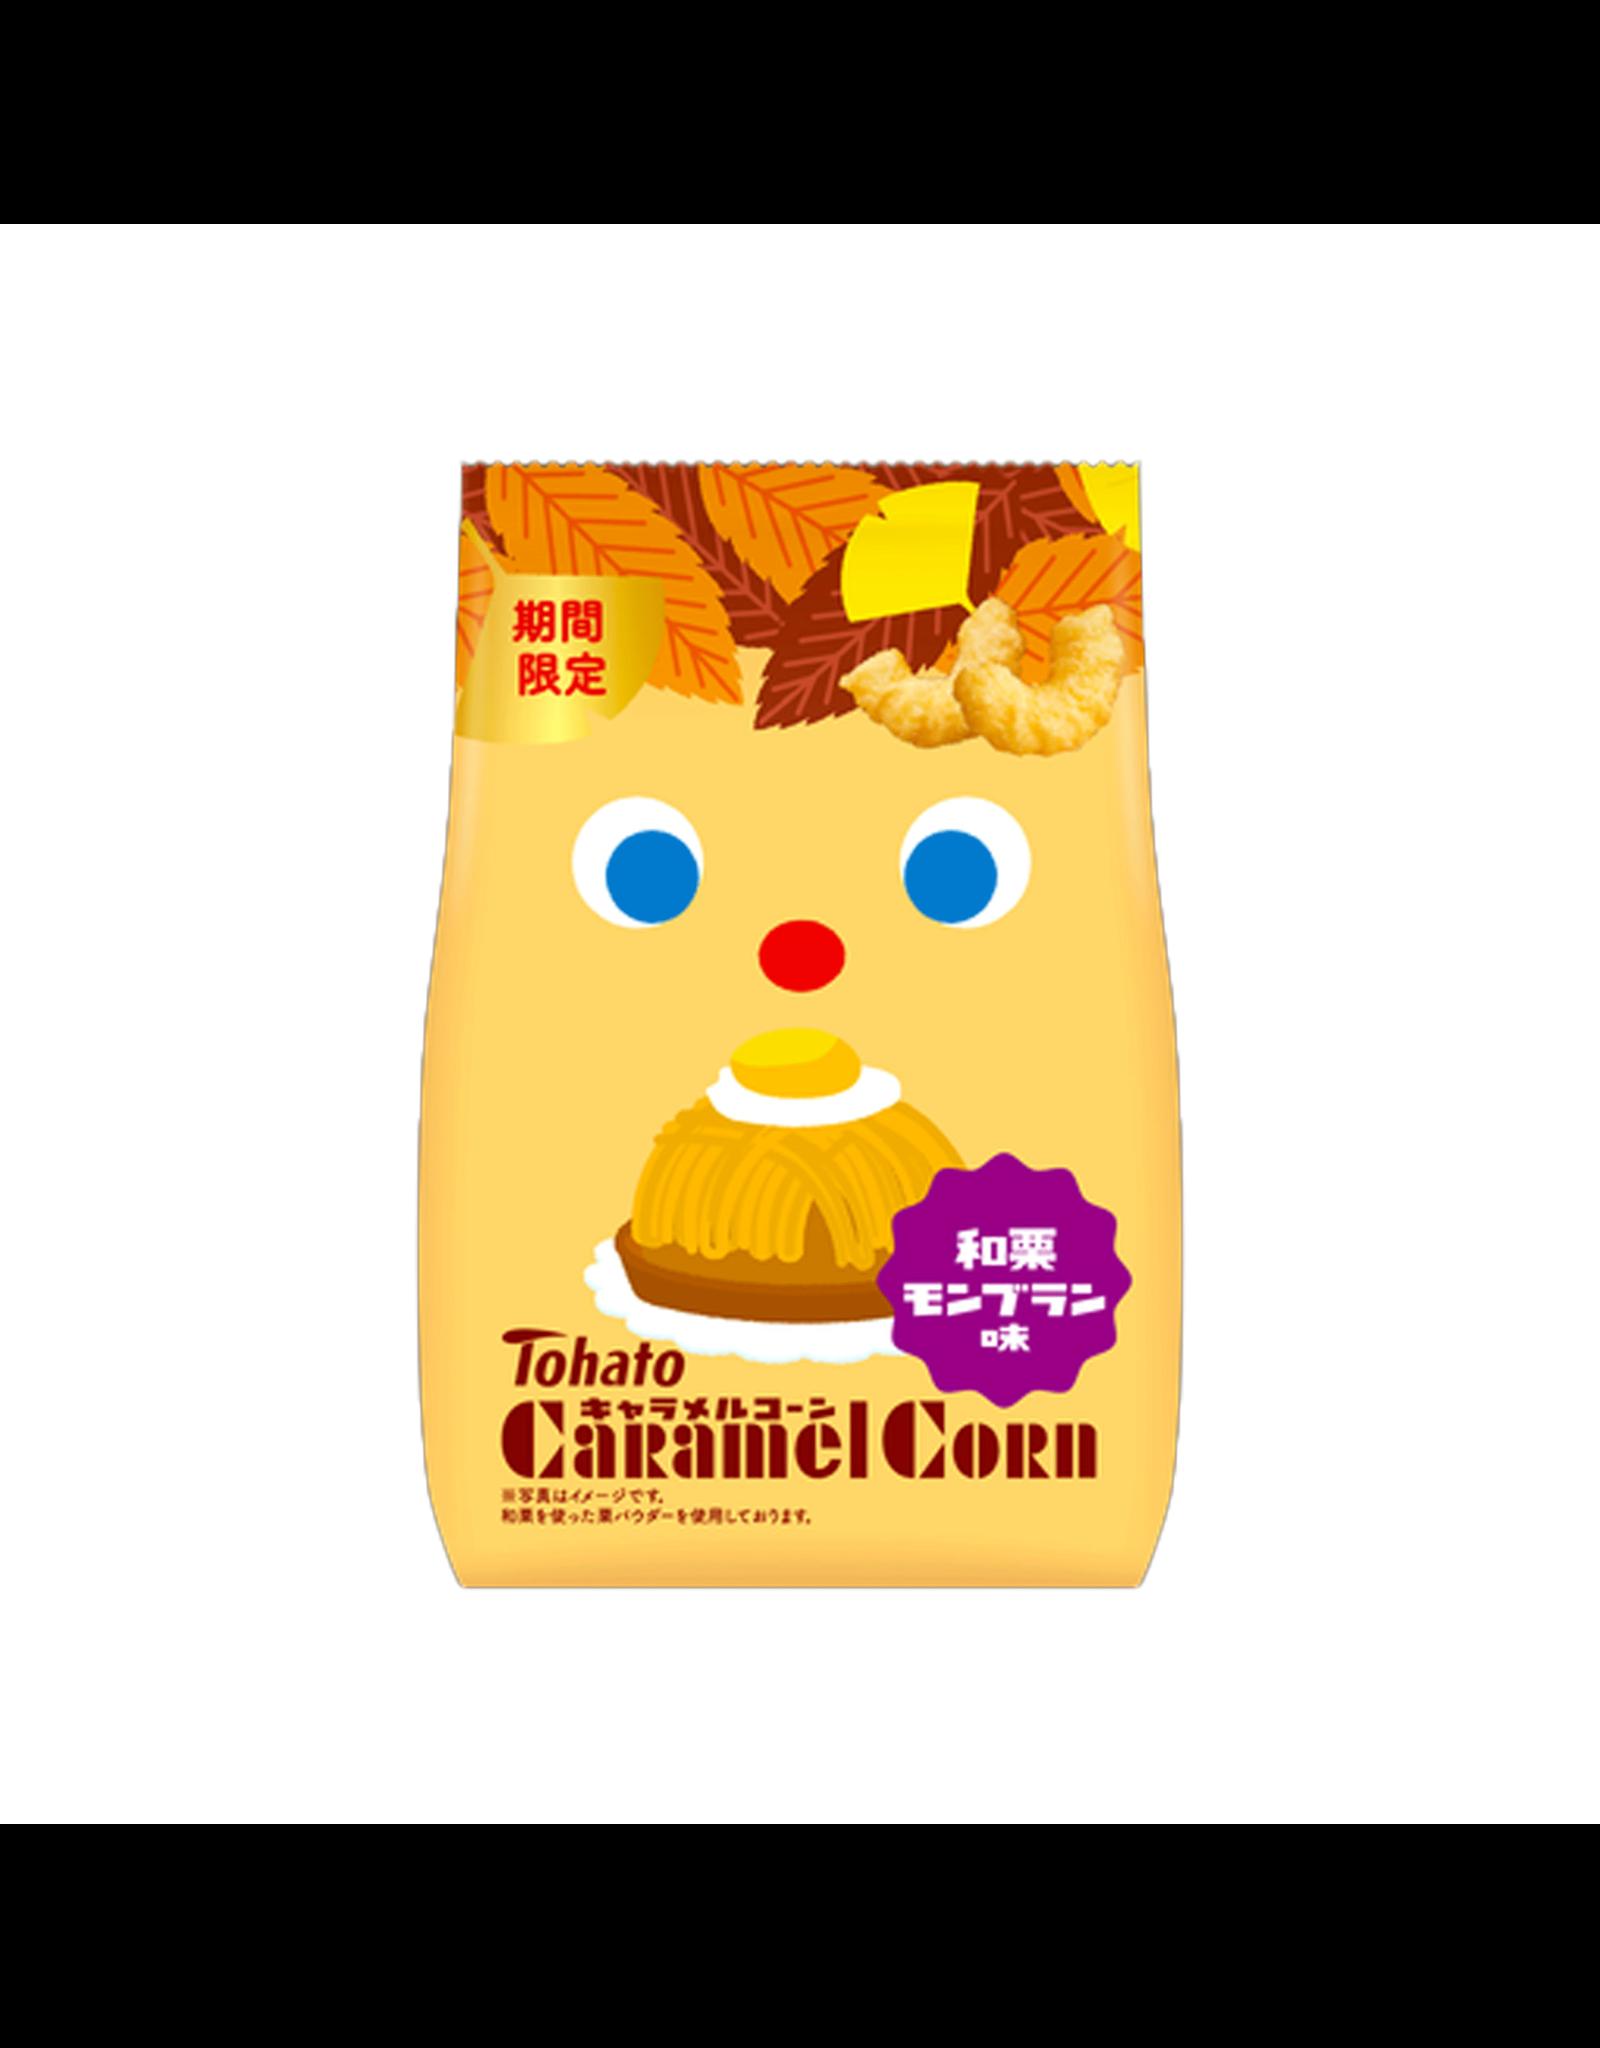 Caramel Corn Chestnut Mont Blanc